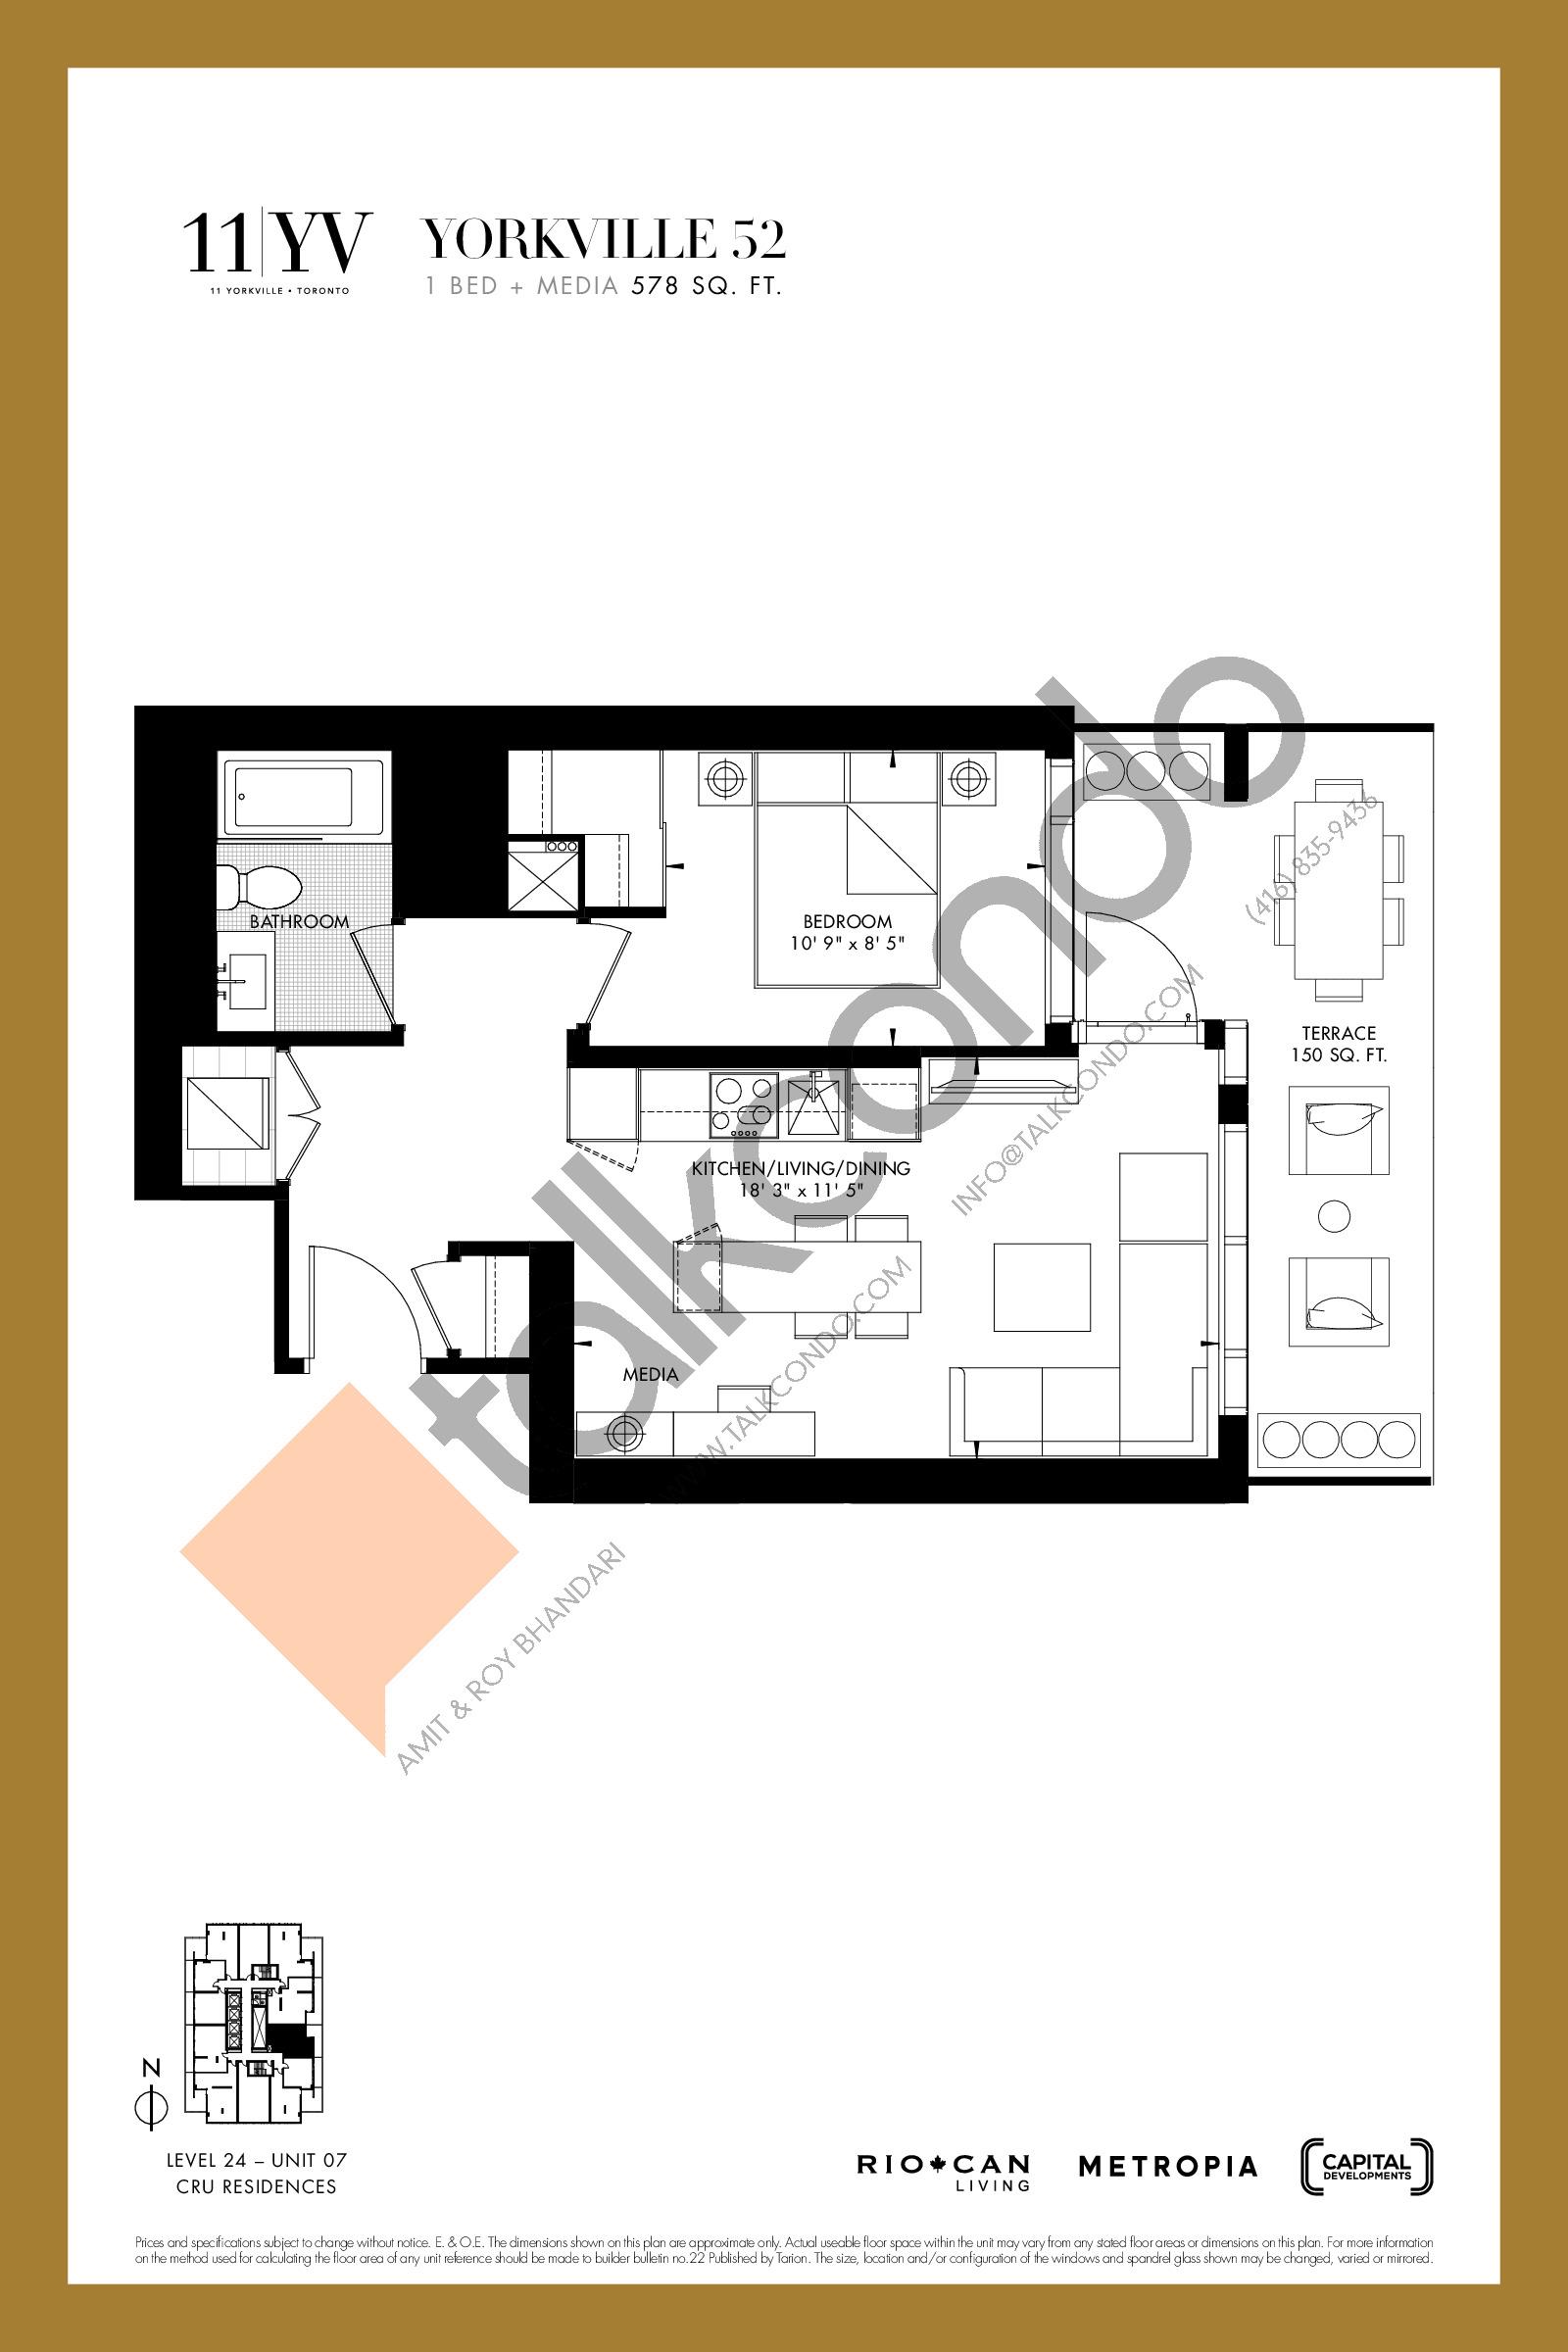 Yorkville 52 Floor Plan at 11YV Condos - 578 sq.ft